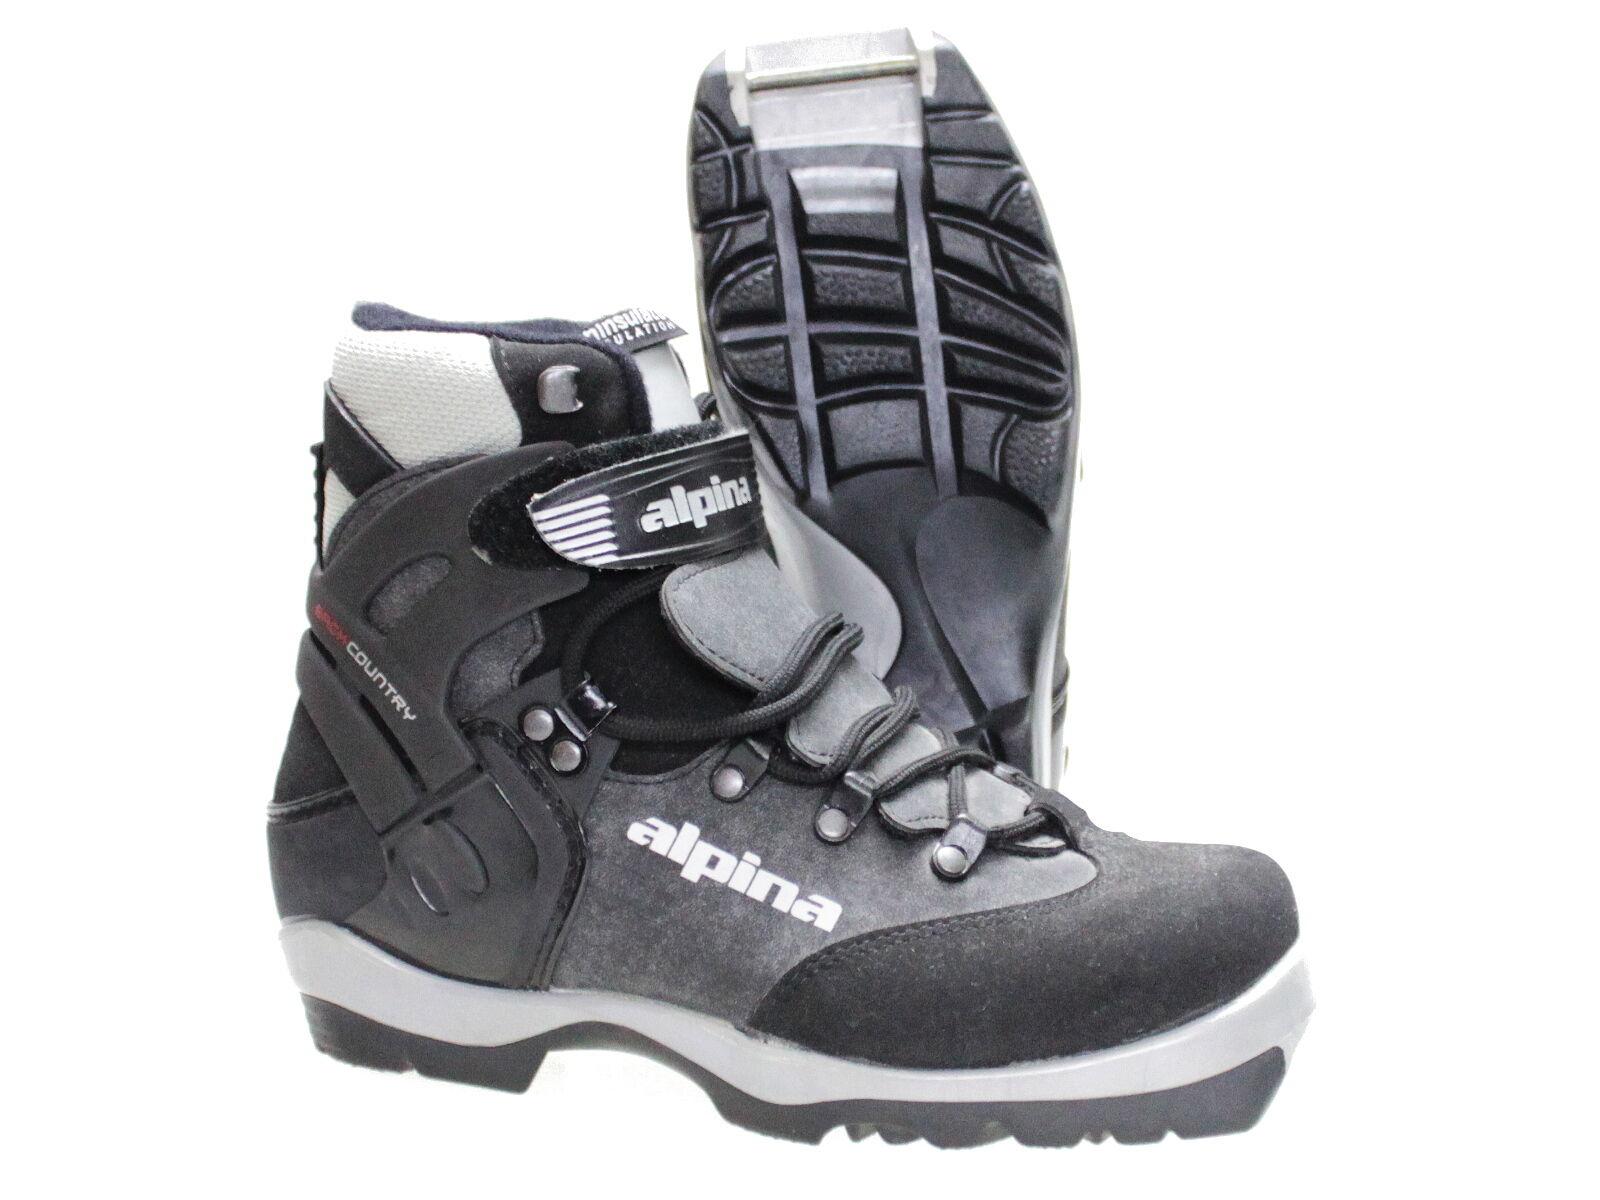 Langlaufschuh Skischuh ALPINA Back Country Gr 36 37 47 48 Bindung NNN S-N 7